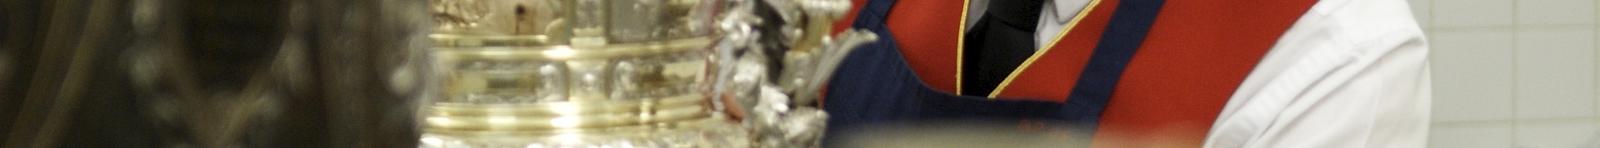 A footman polishing silver at Buckingham Palace